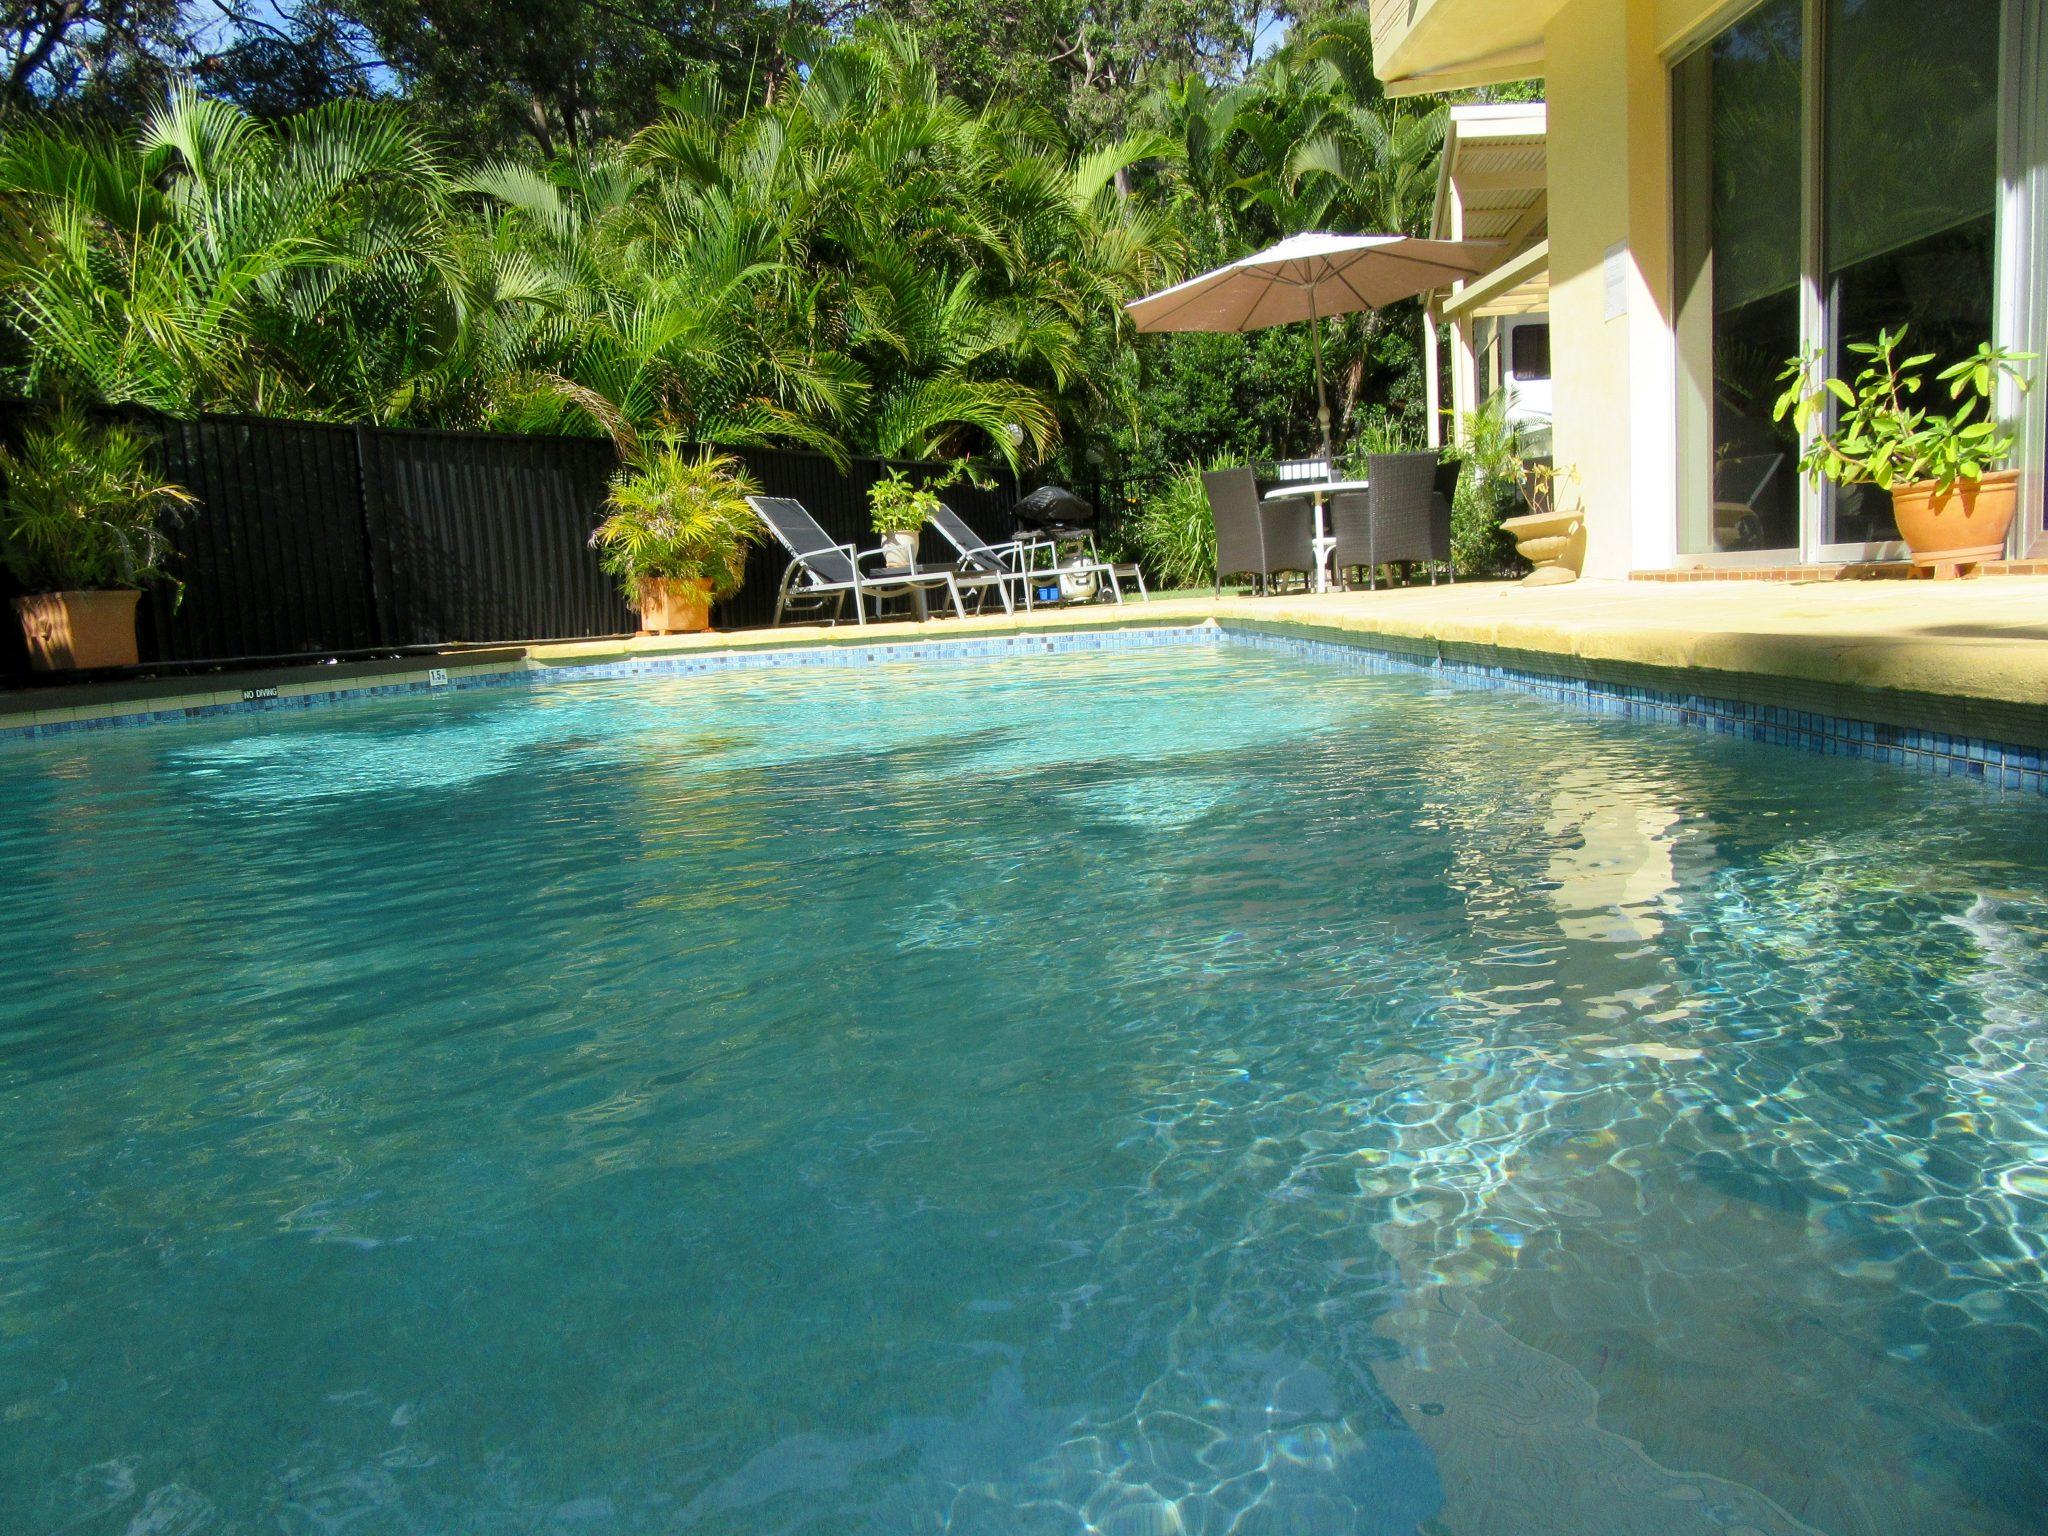 Noosa Cove Holiday Apartments